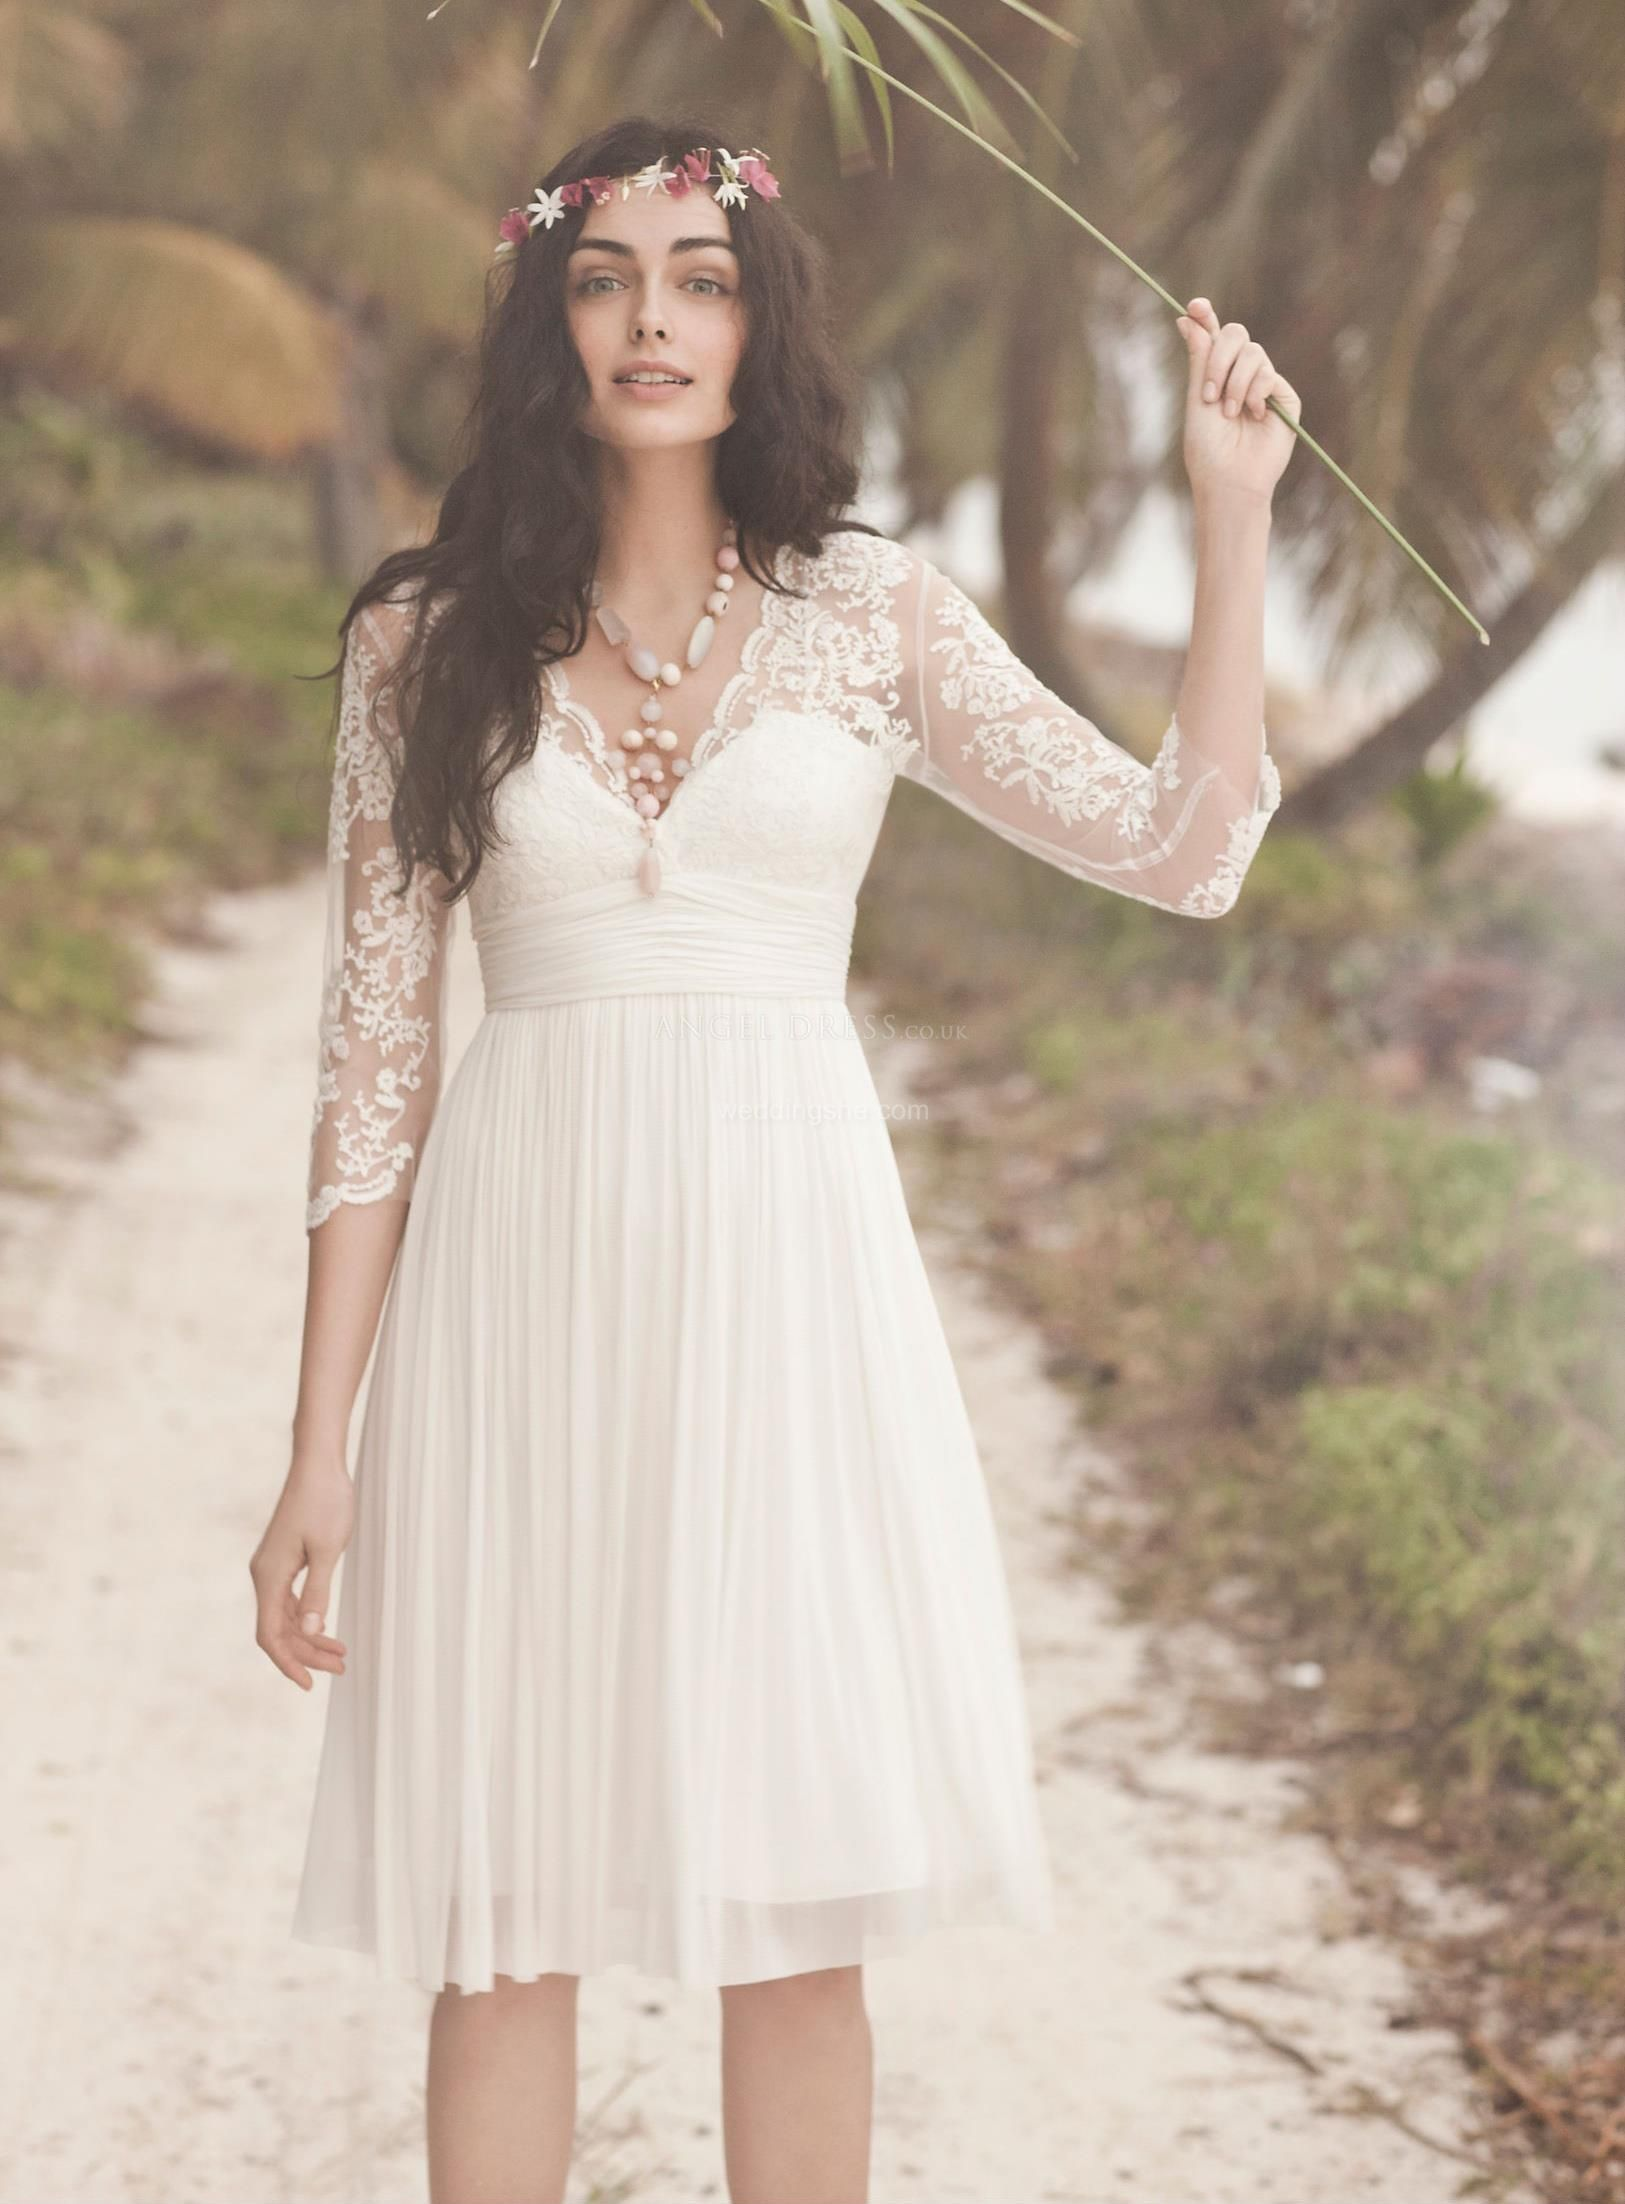 Knee length wedding dress  Chic ALinePrincess Vneck Kneelength Wedding Dresson Sale With